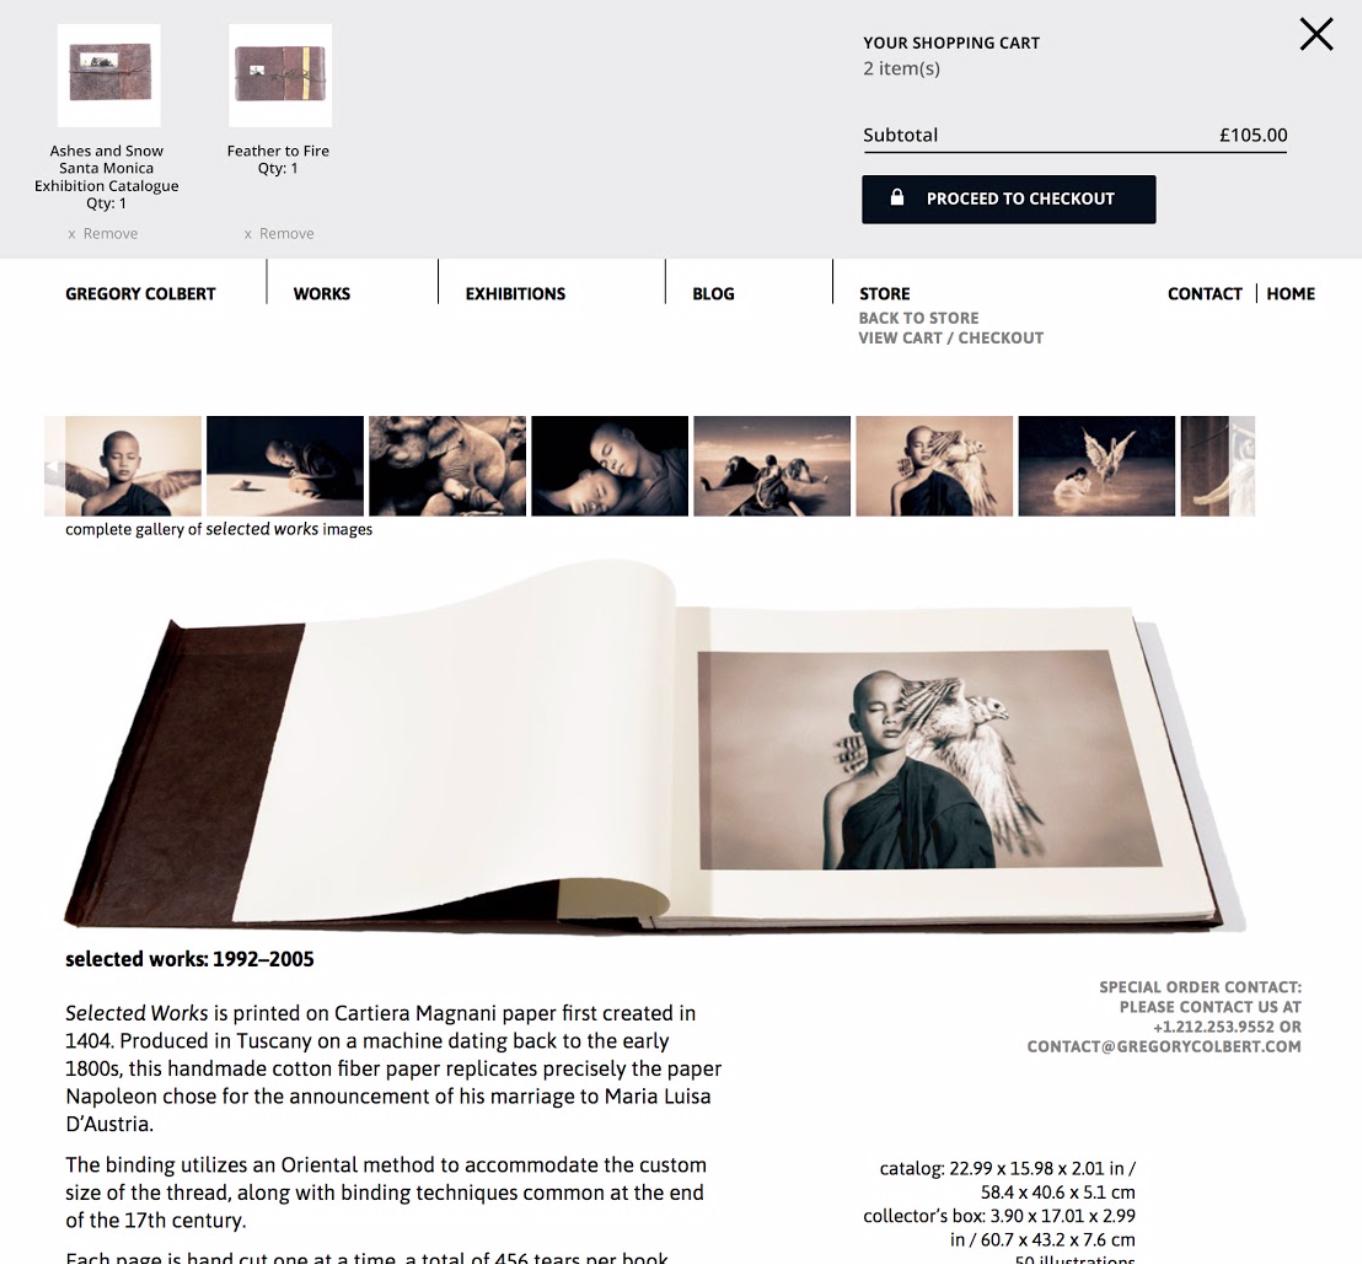 Ingram SupaCart for Coresource customers  - Supadu ecommerce solutions for publishers & university presses